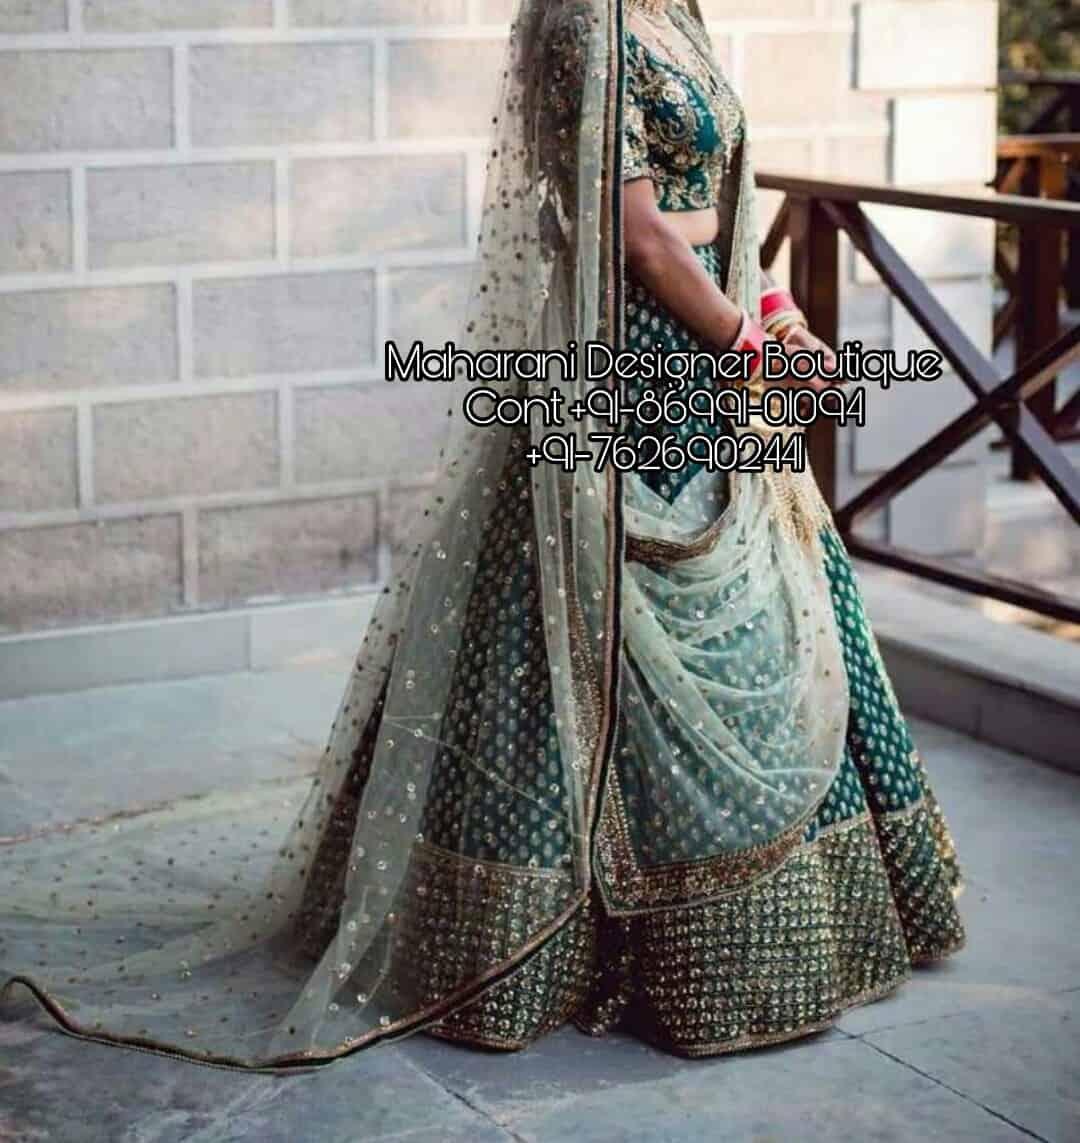 adef4802c6 Indian Bridal Lehenga Online India | Maharani Designer Boutique